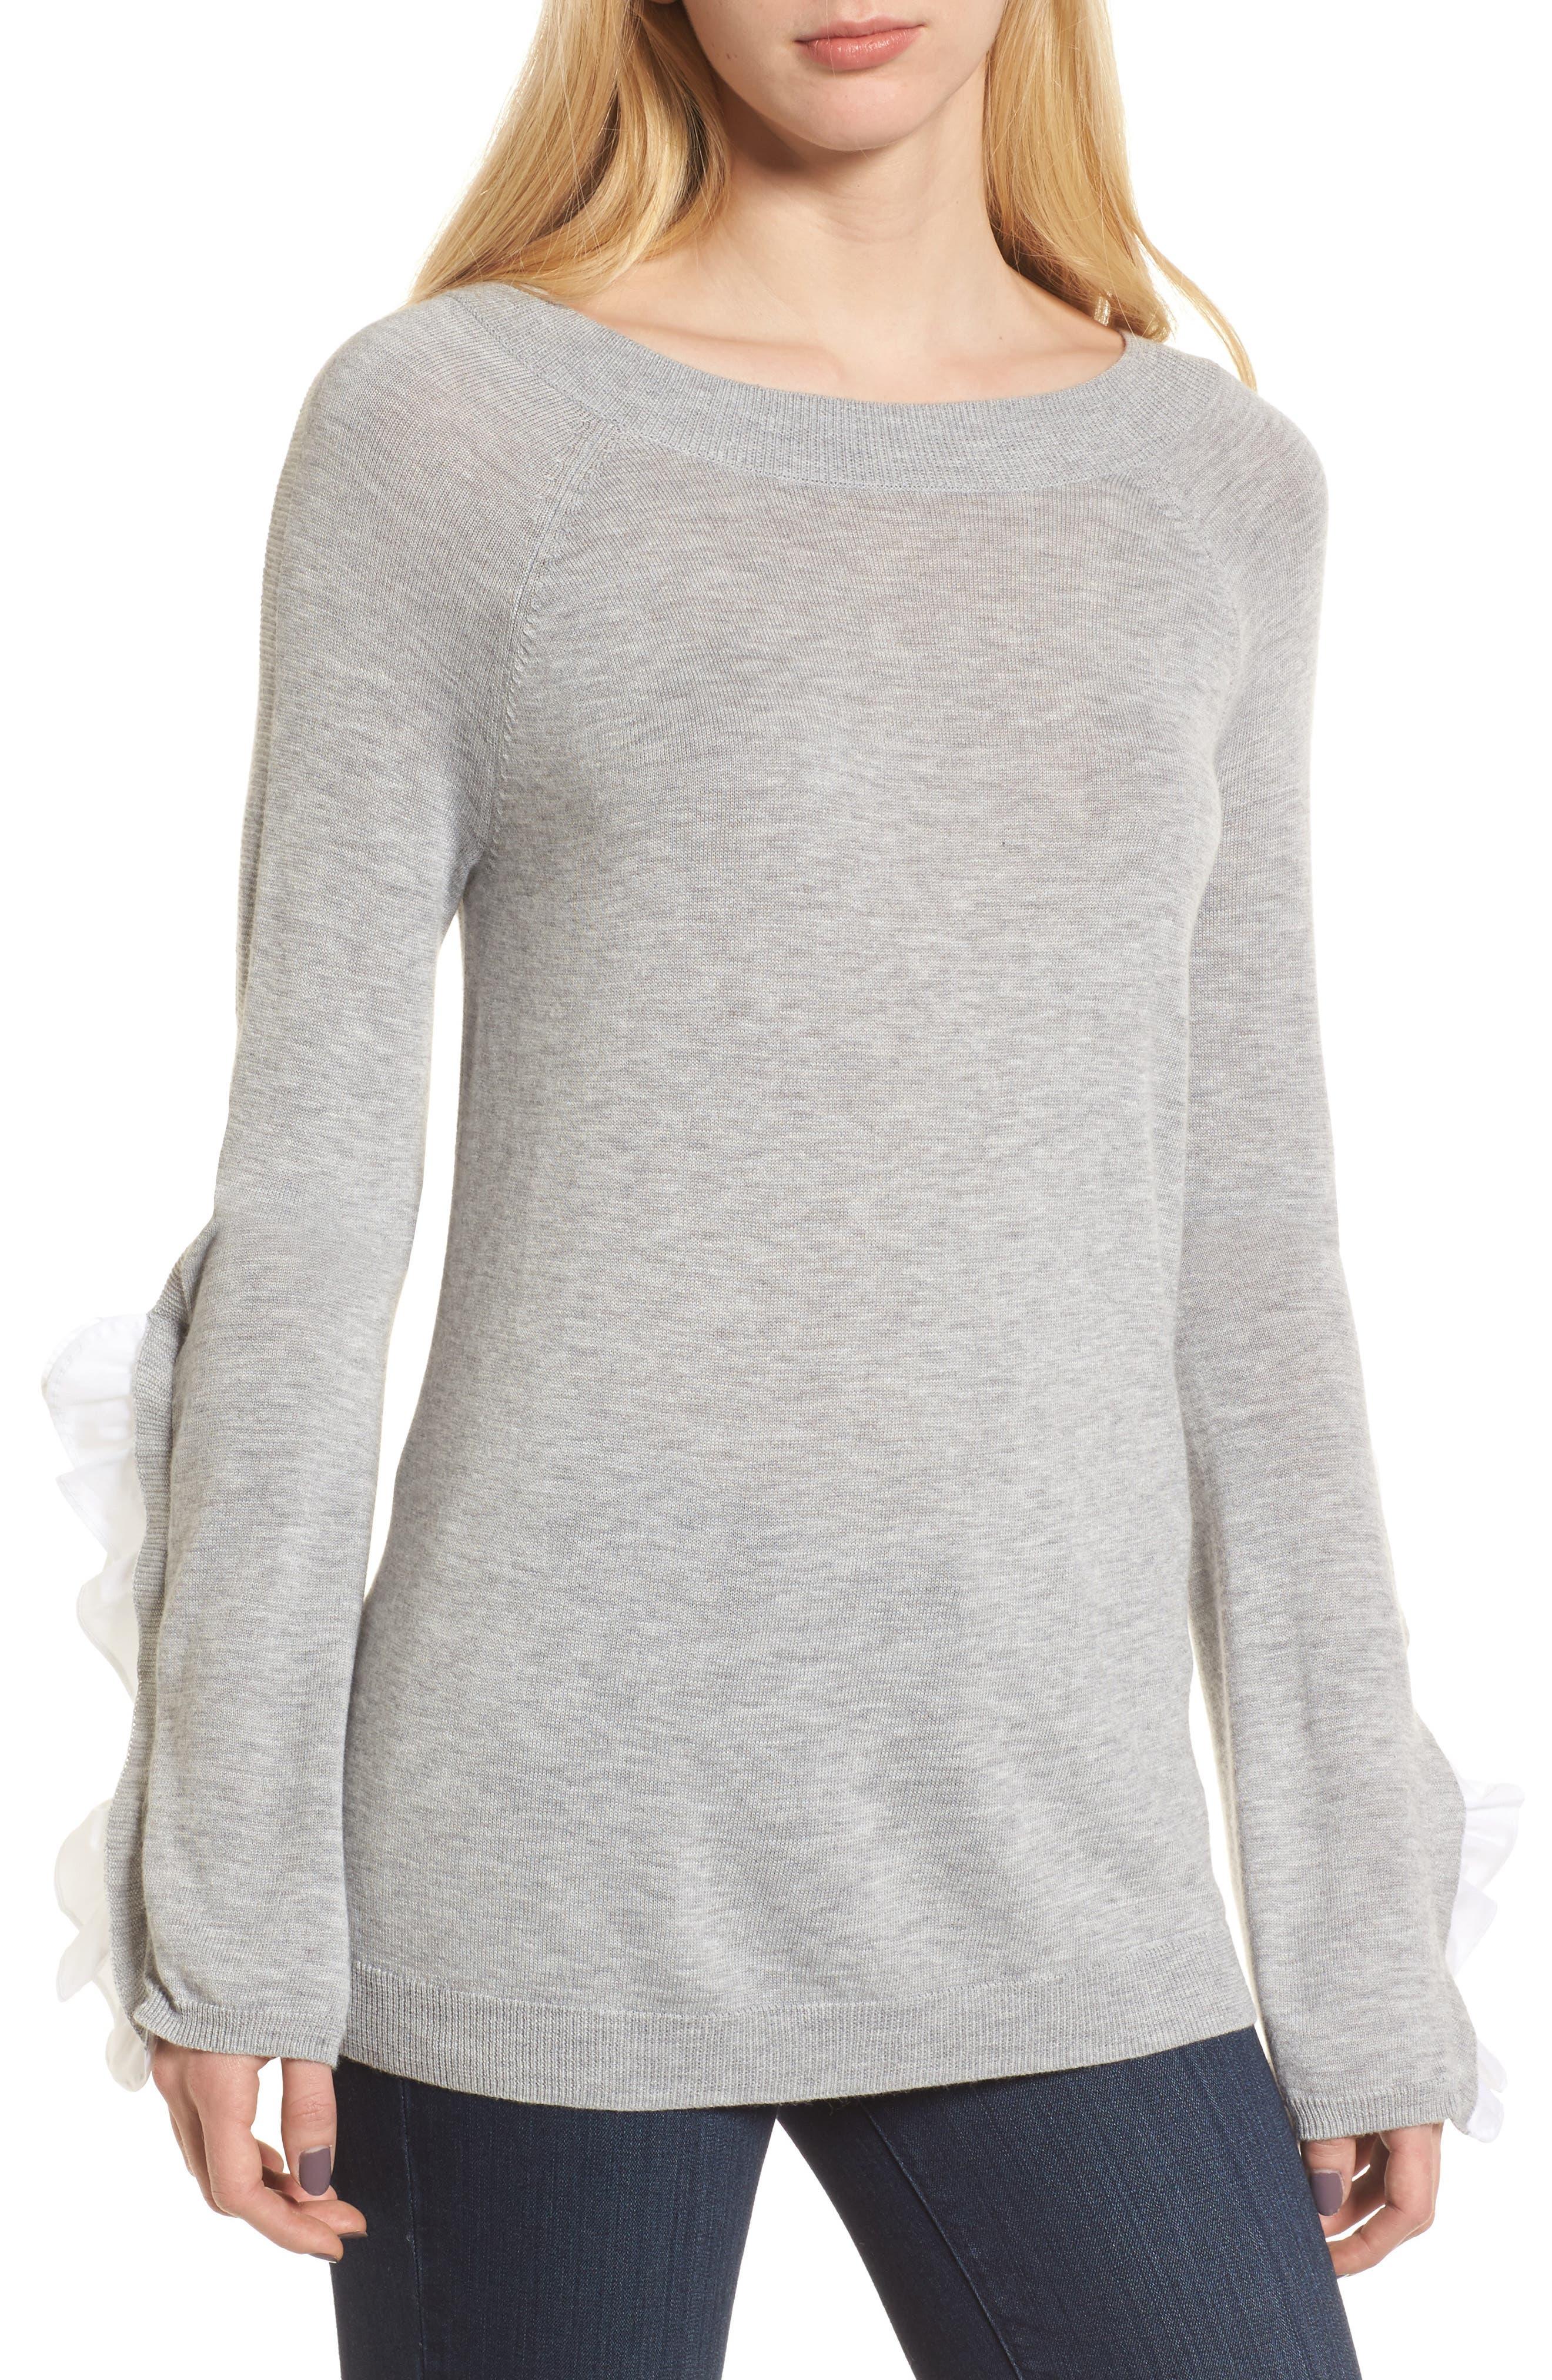 Ruffle Sleeve Sweater,                         Main,                         color, Grey Heather